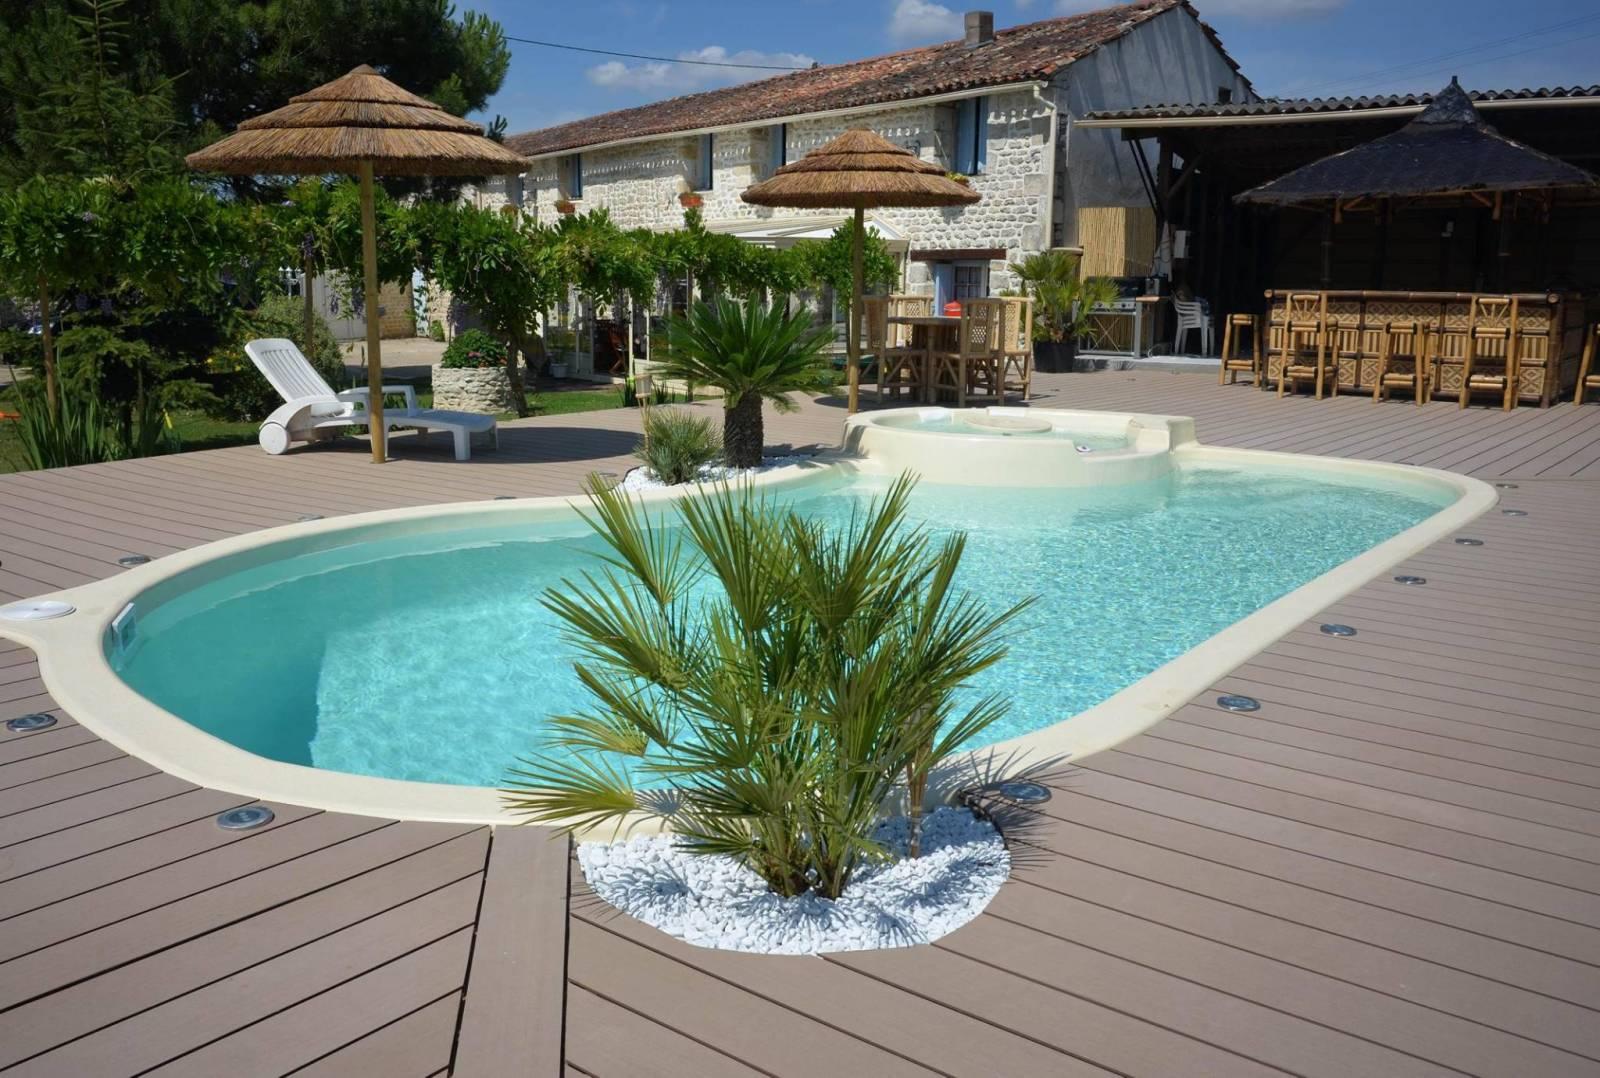 fabricant de piscines coque montpellier freedom piscines. Black Bedroom Furniture Sets. Home Design Ideas